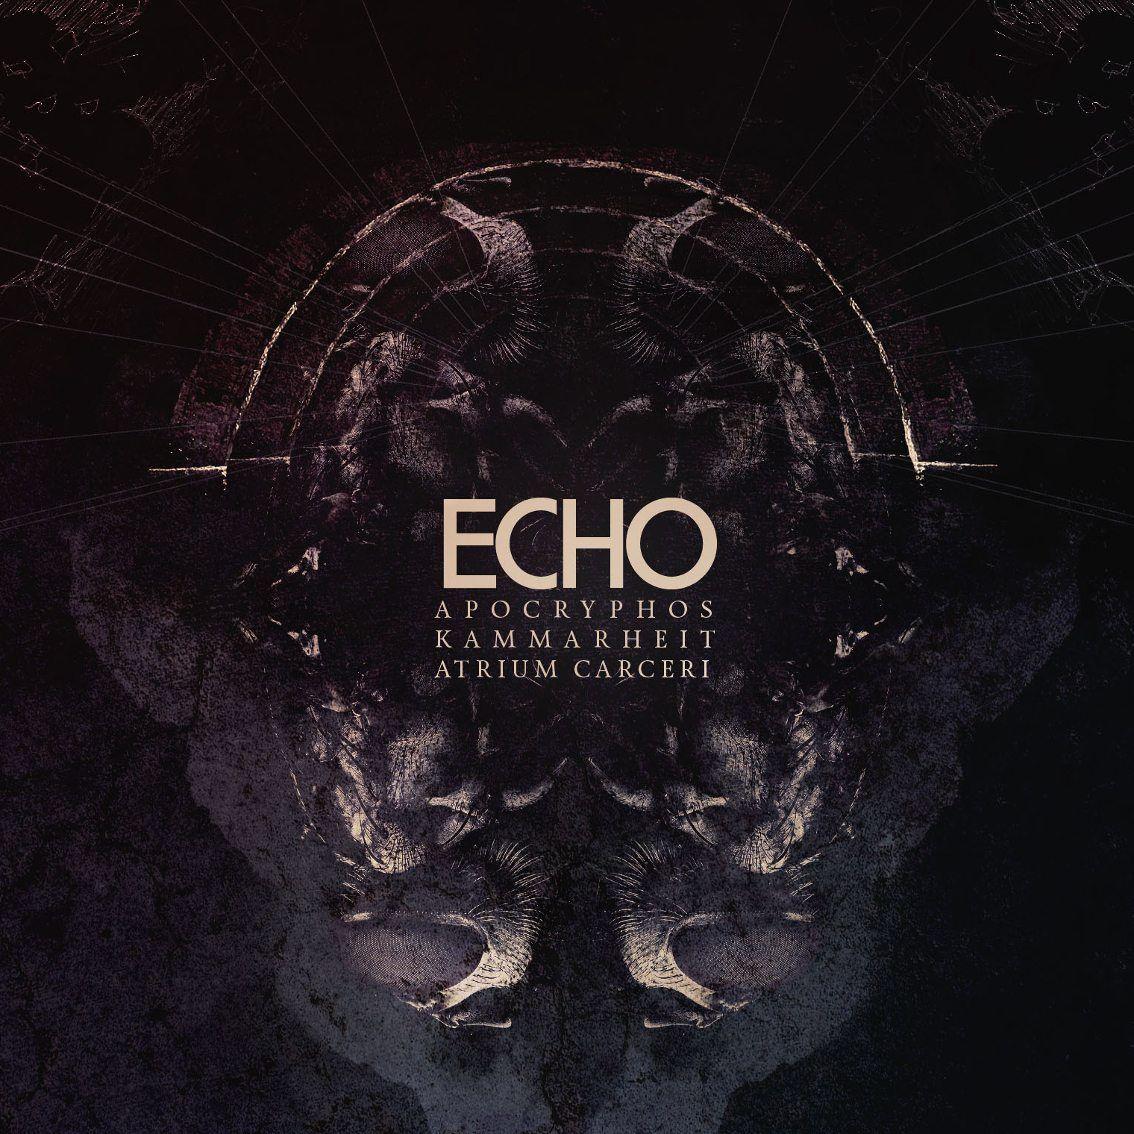 Apocryphos, Kammarheit, Atrium Carceri reunite for'Echo' album - listen to first 2 tracks !